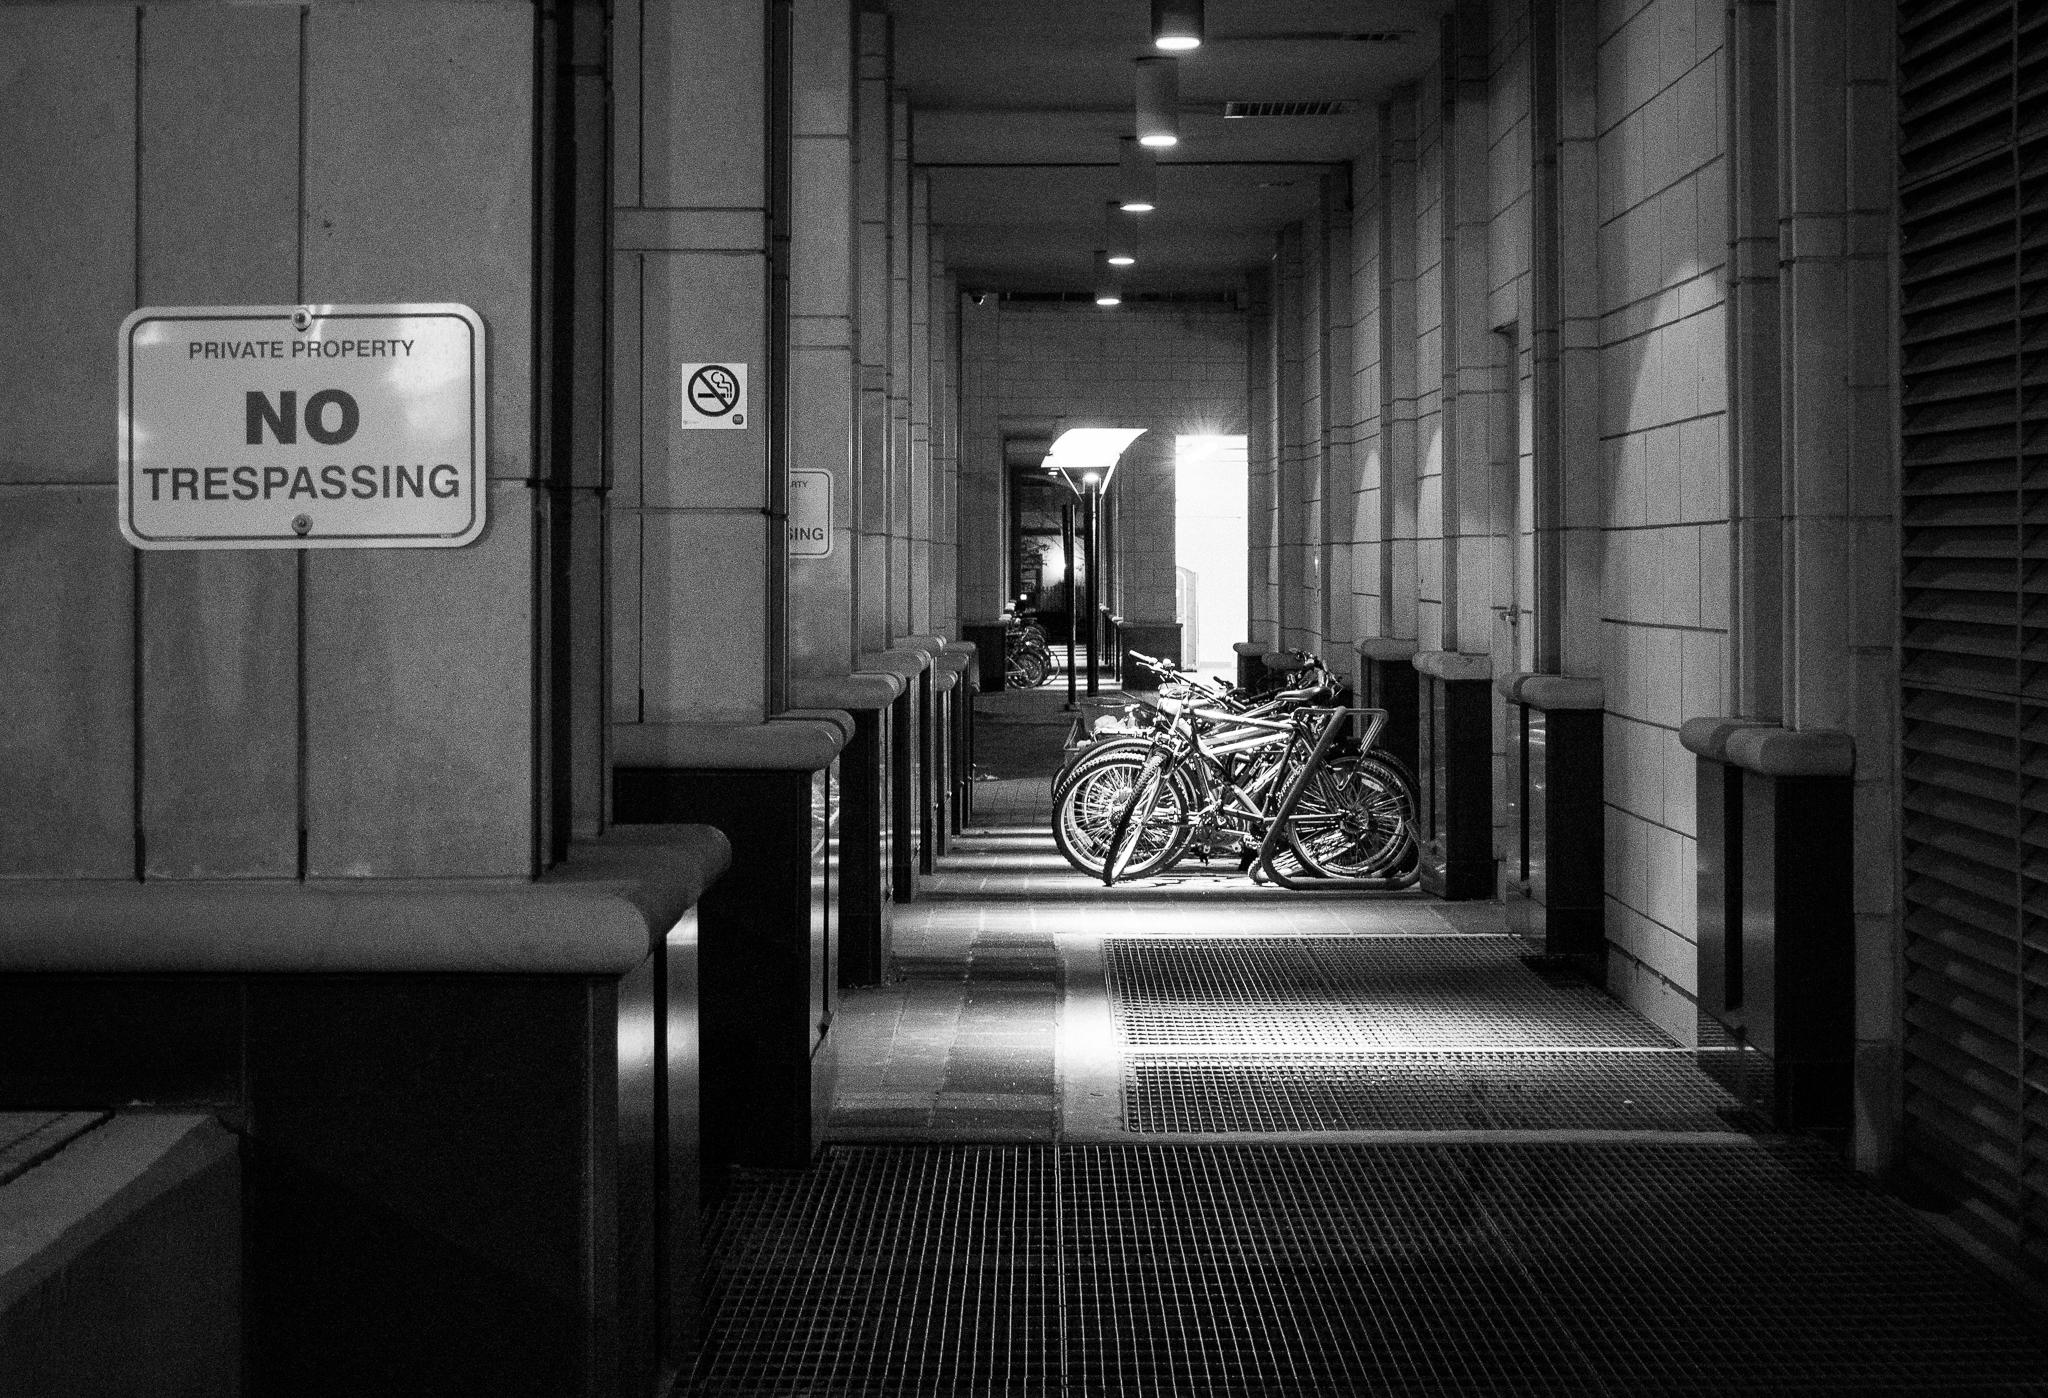 No Trespassing (1/20s, f/6.3, ISO5000)